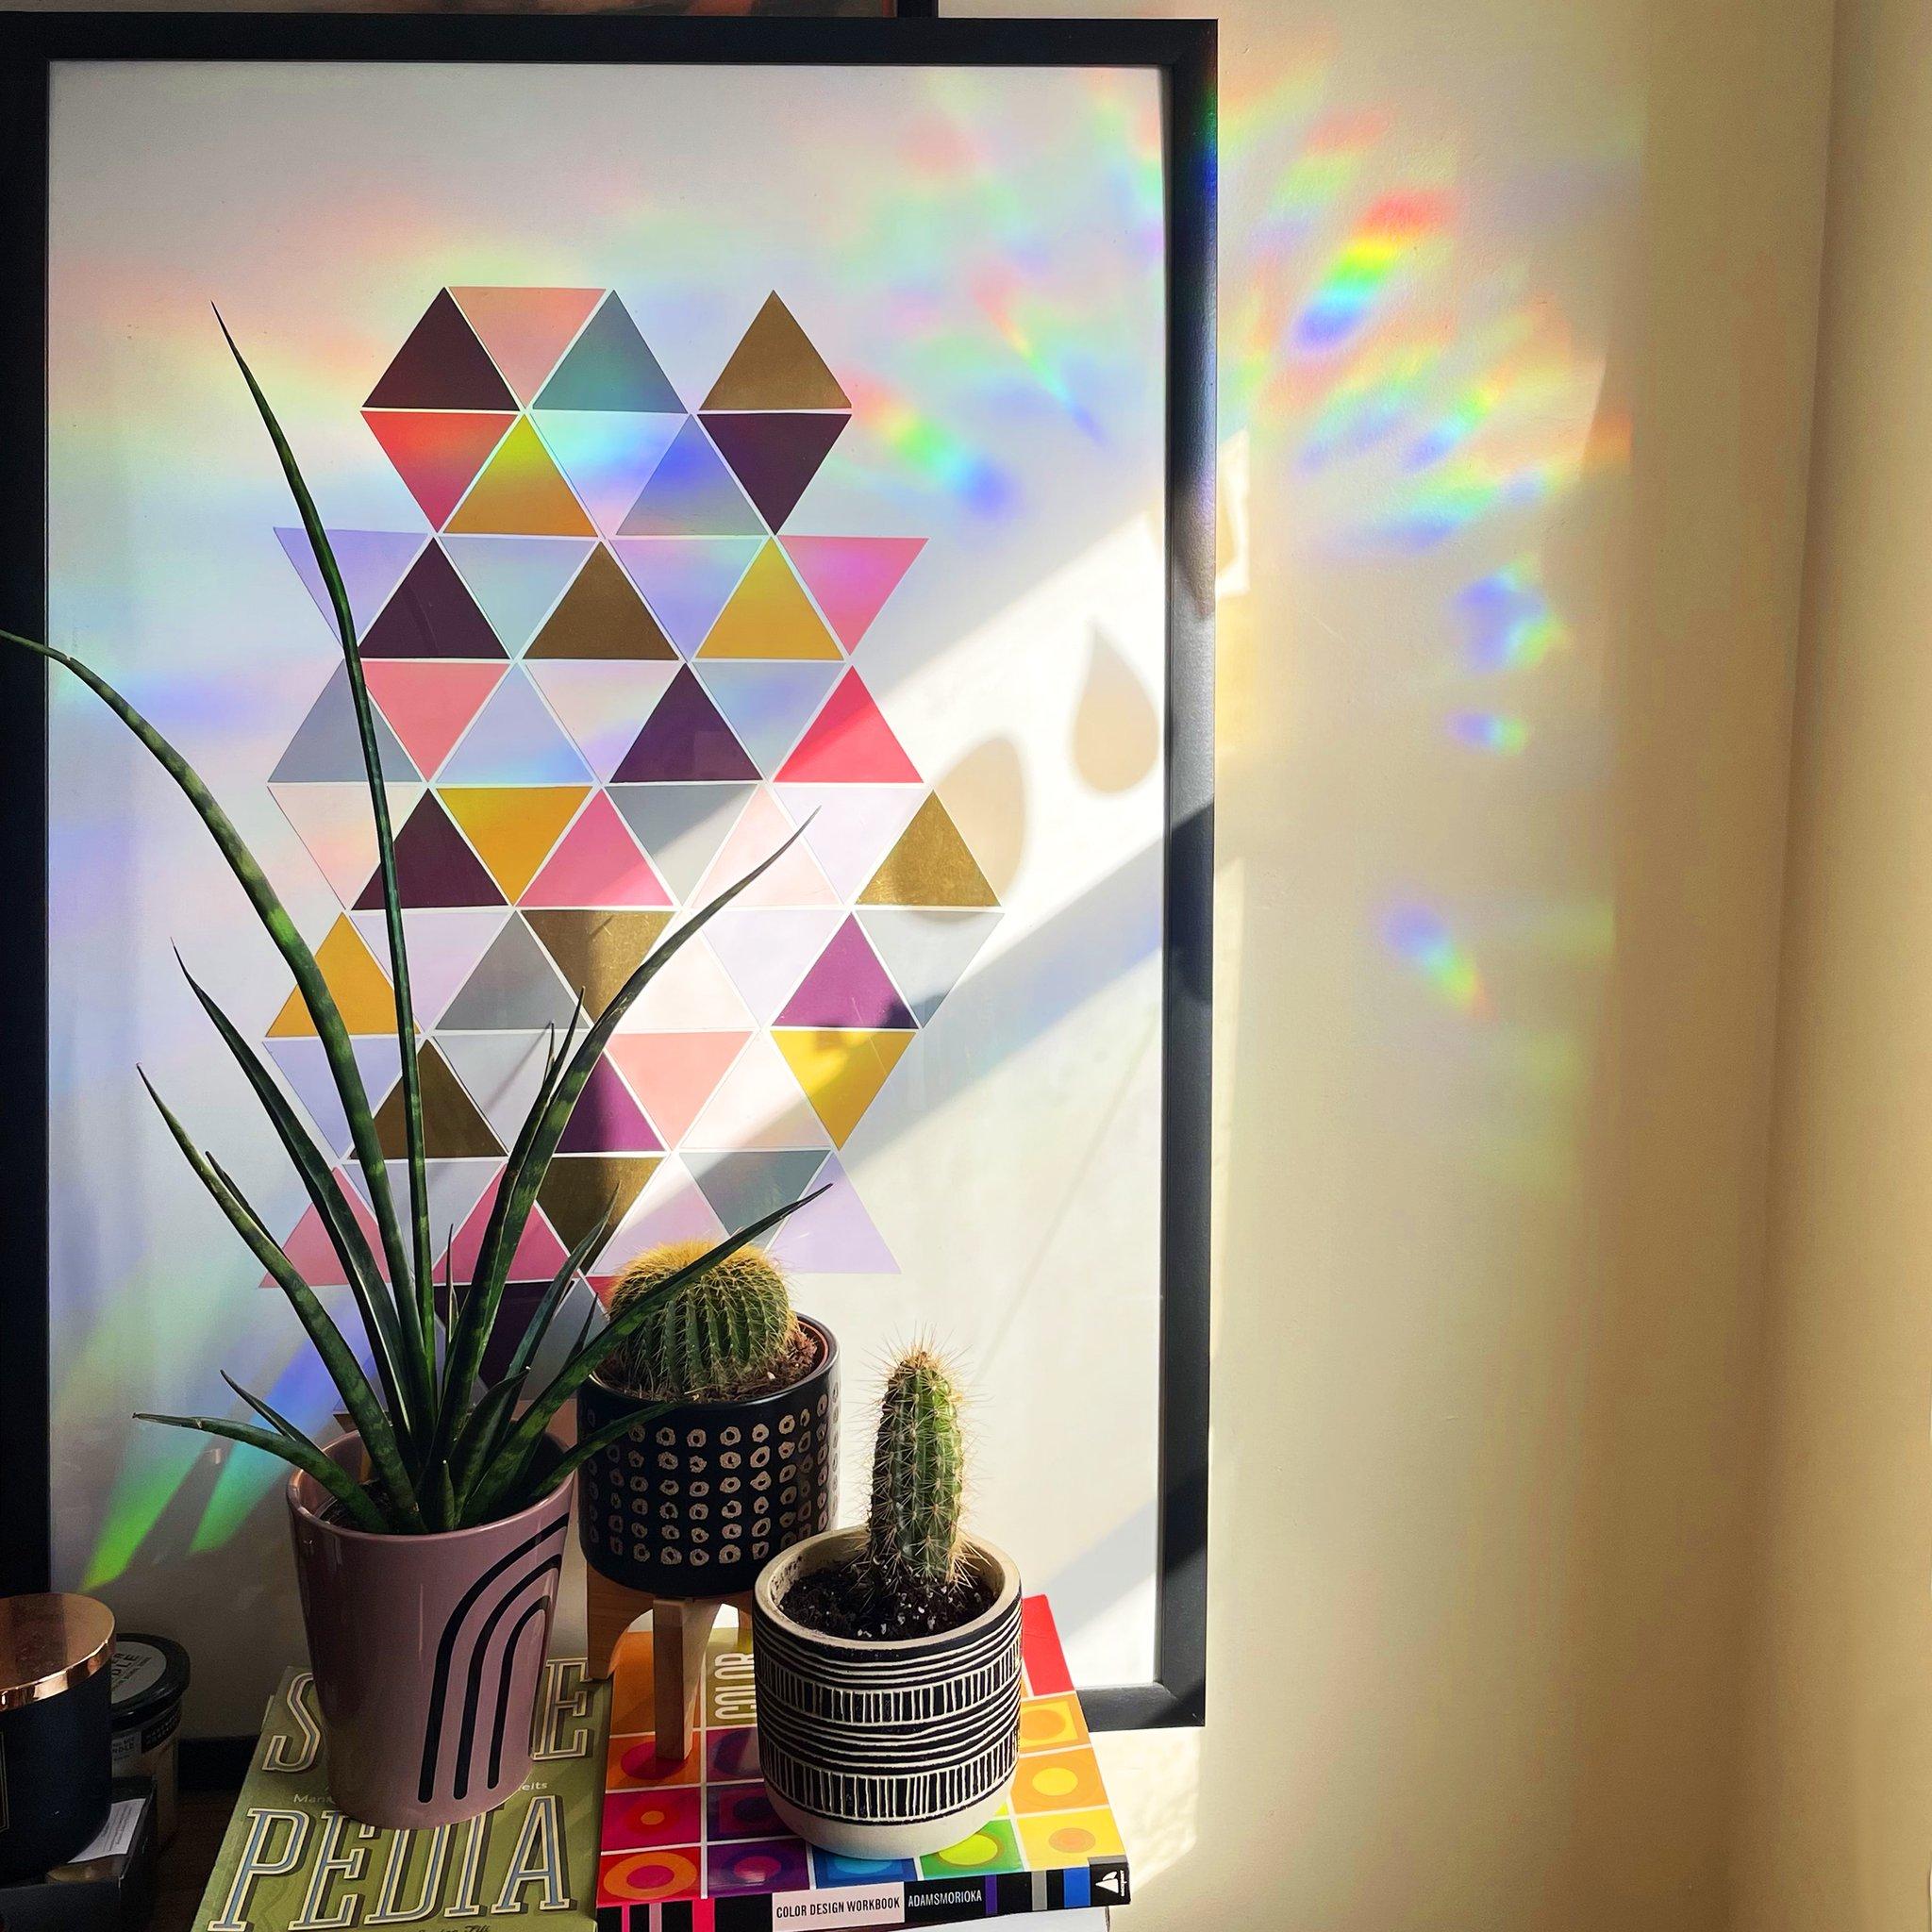 Color Wheel Rainbow Suncatcher Sticker in action